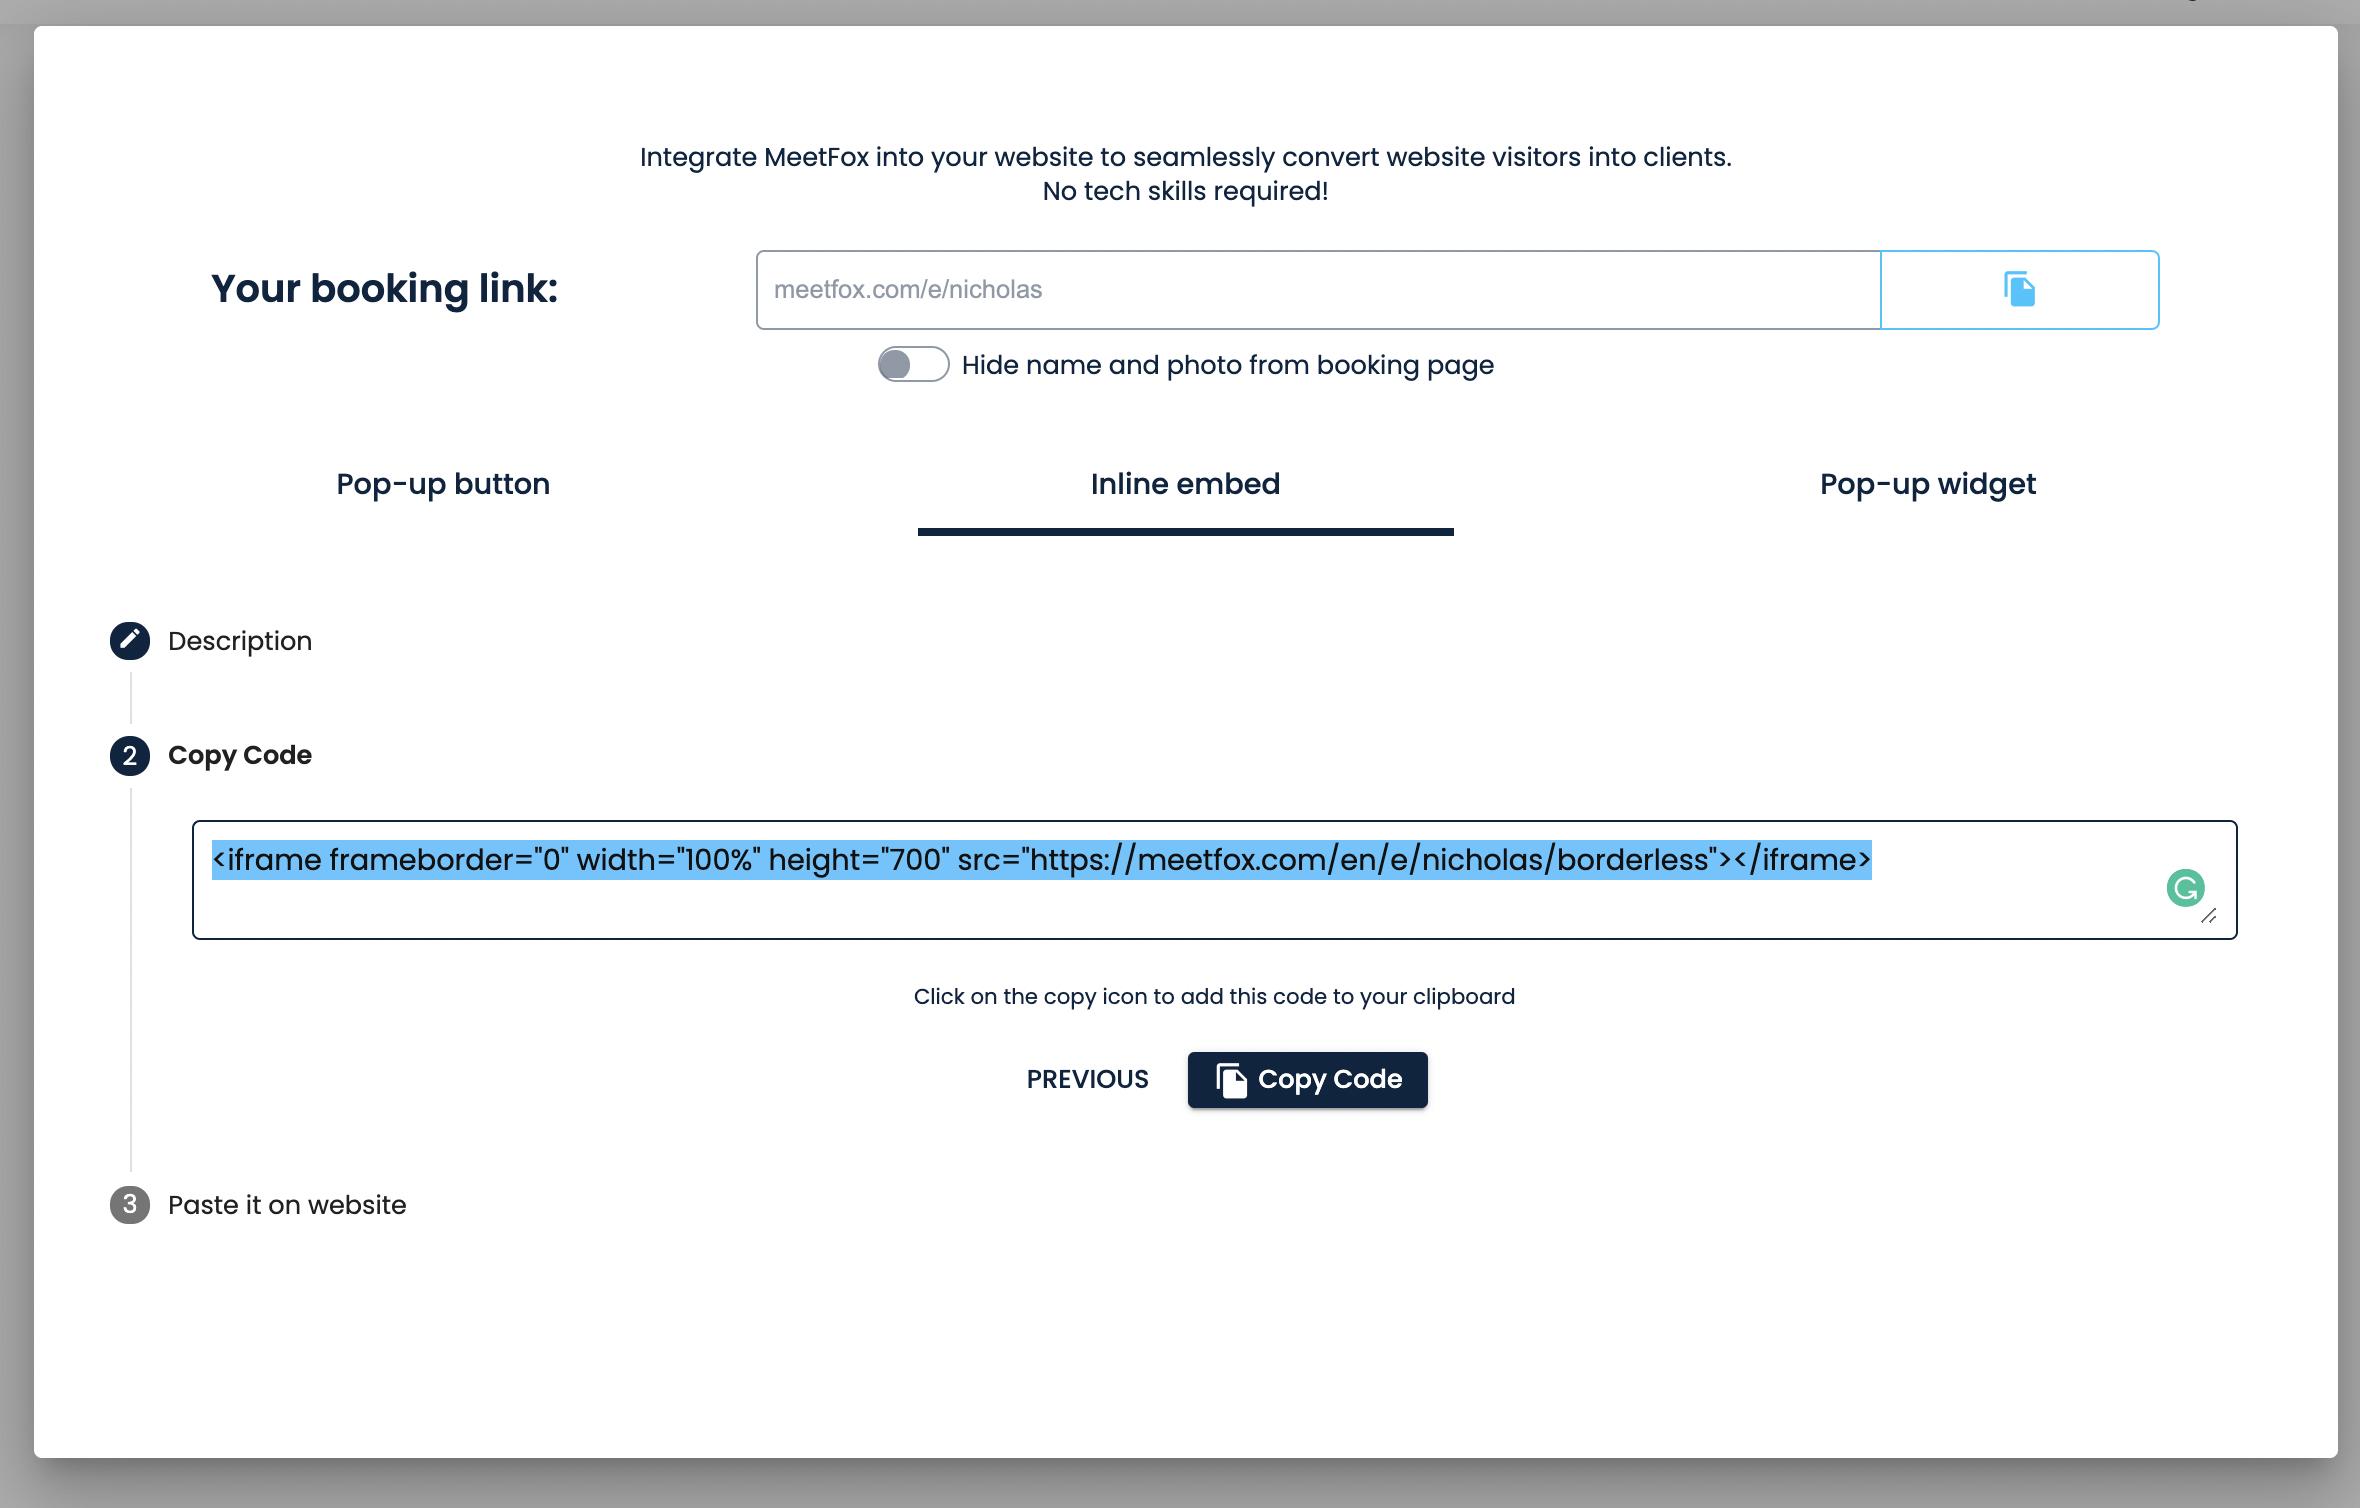 HTML code to embed MeetFox on website